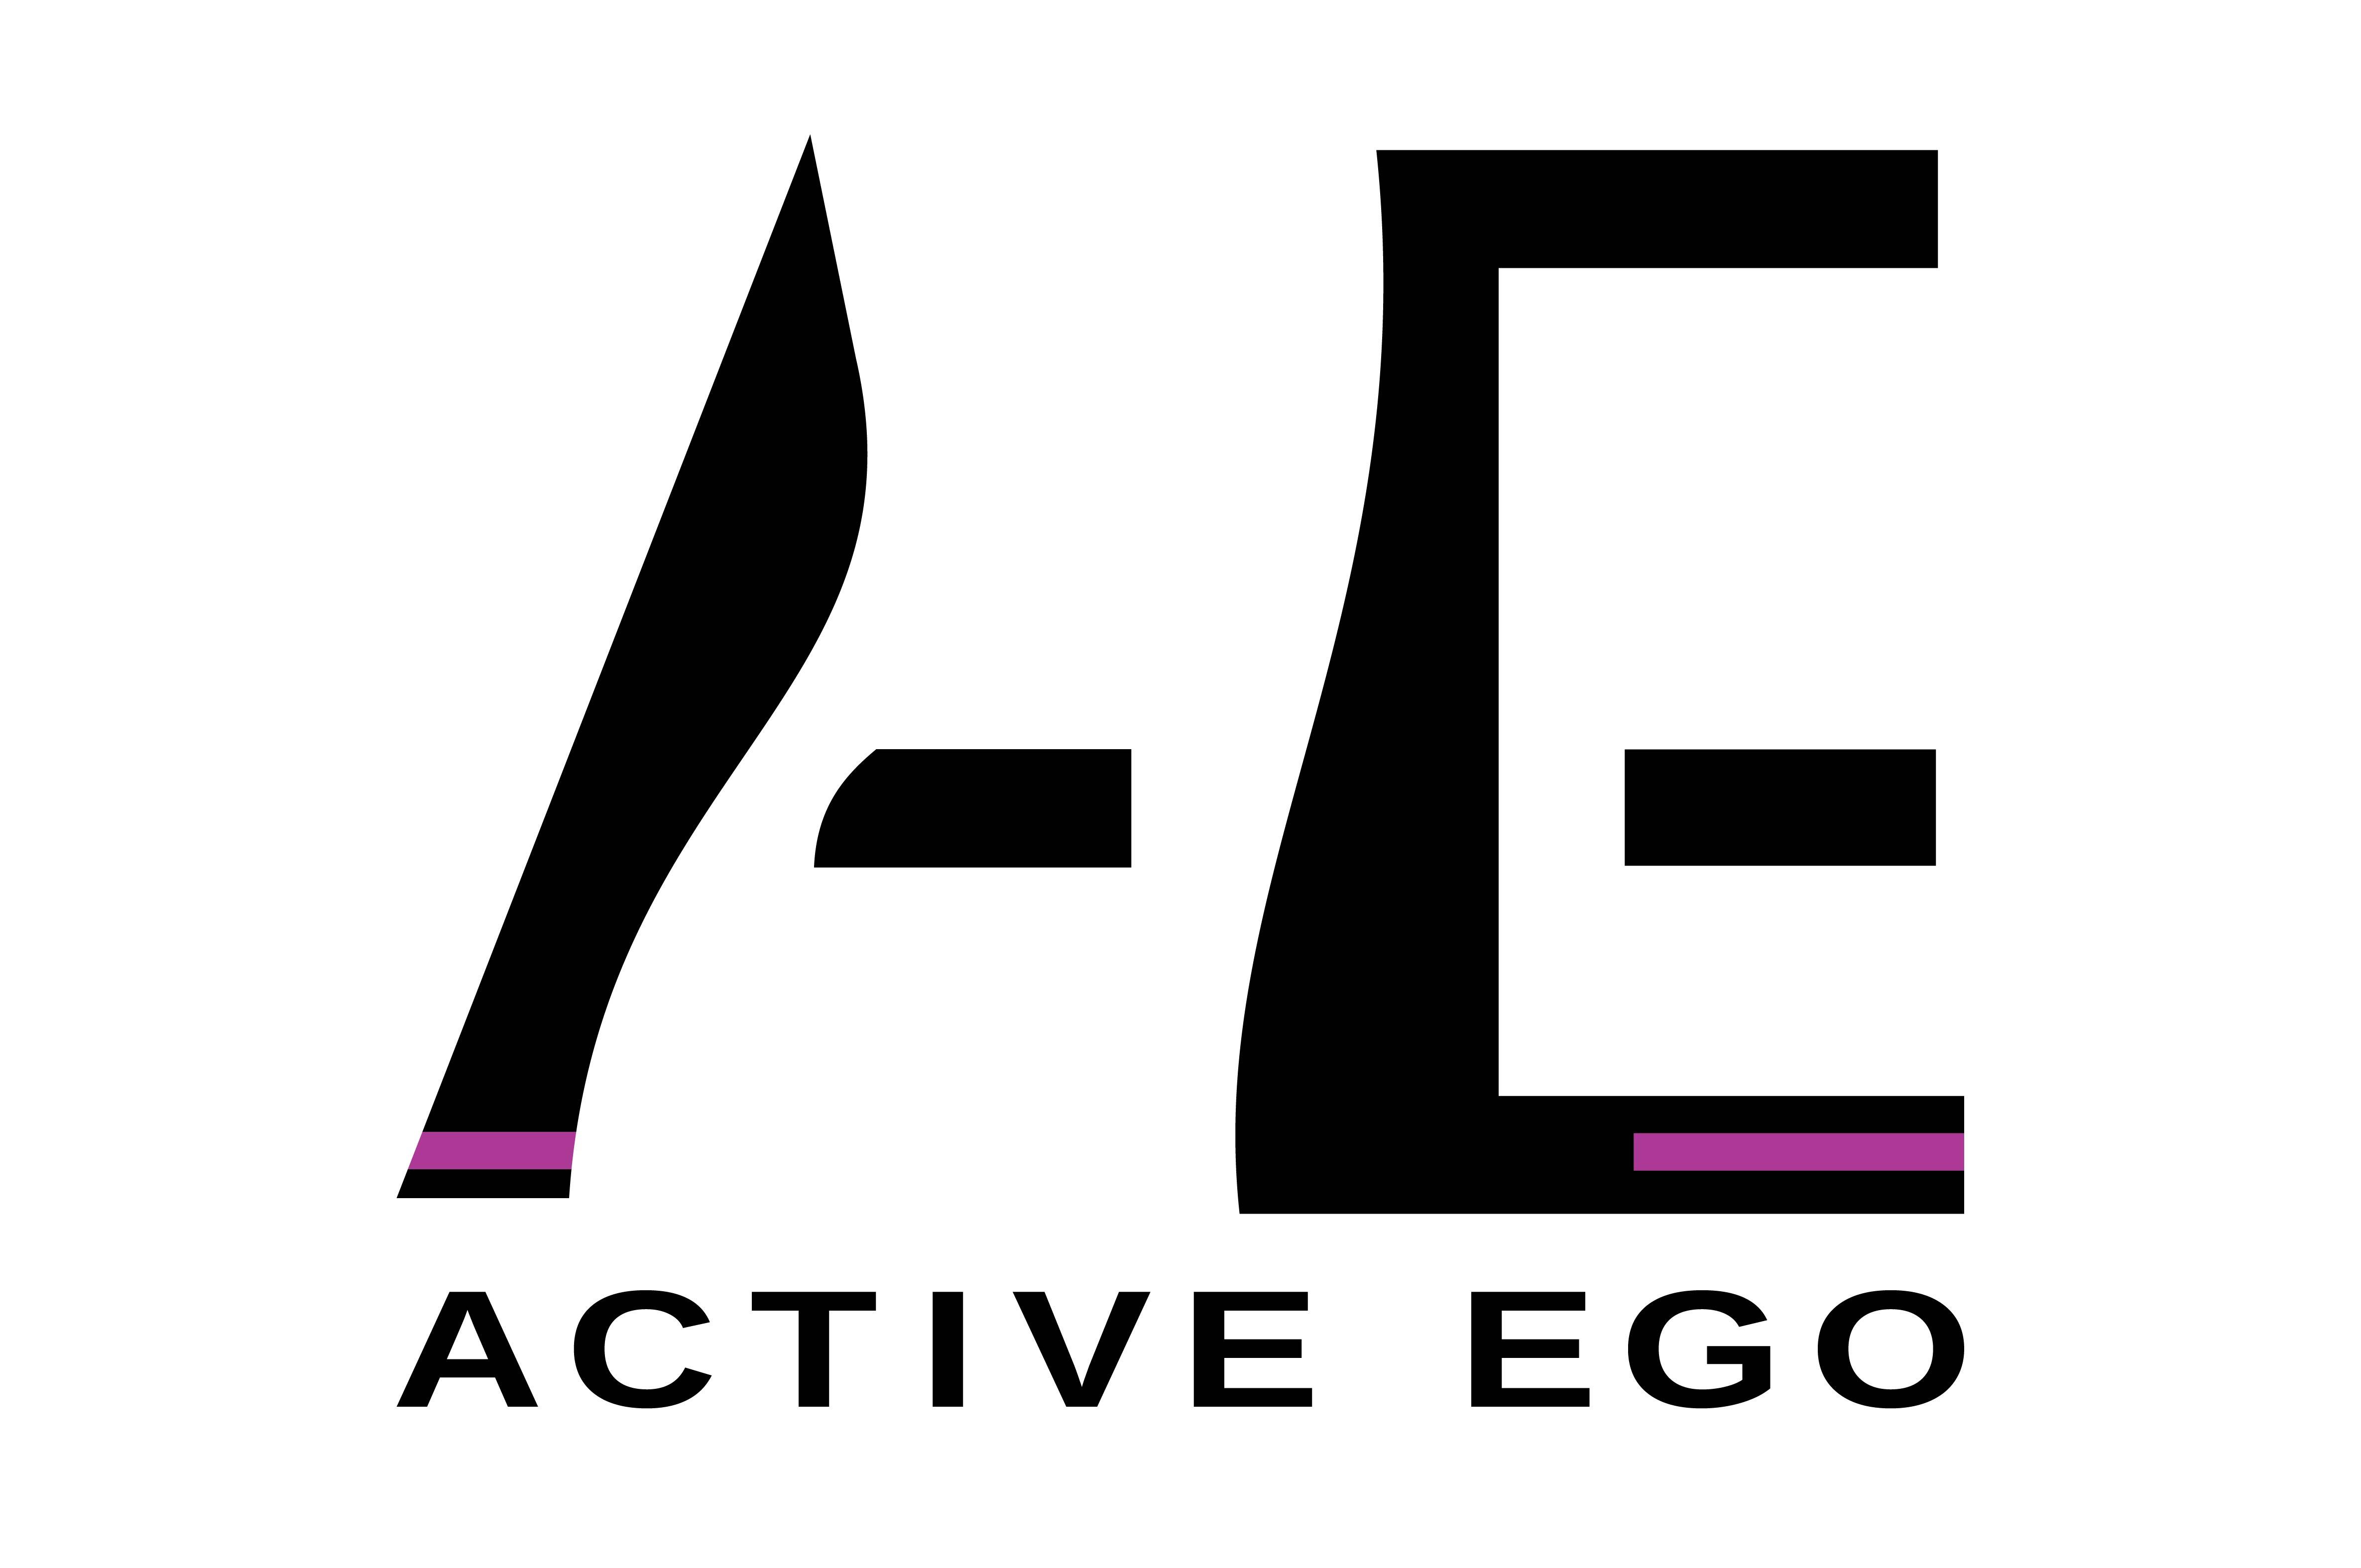 Active Ego